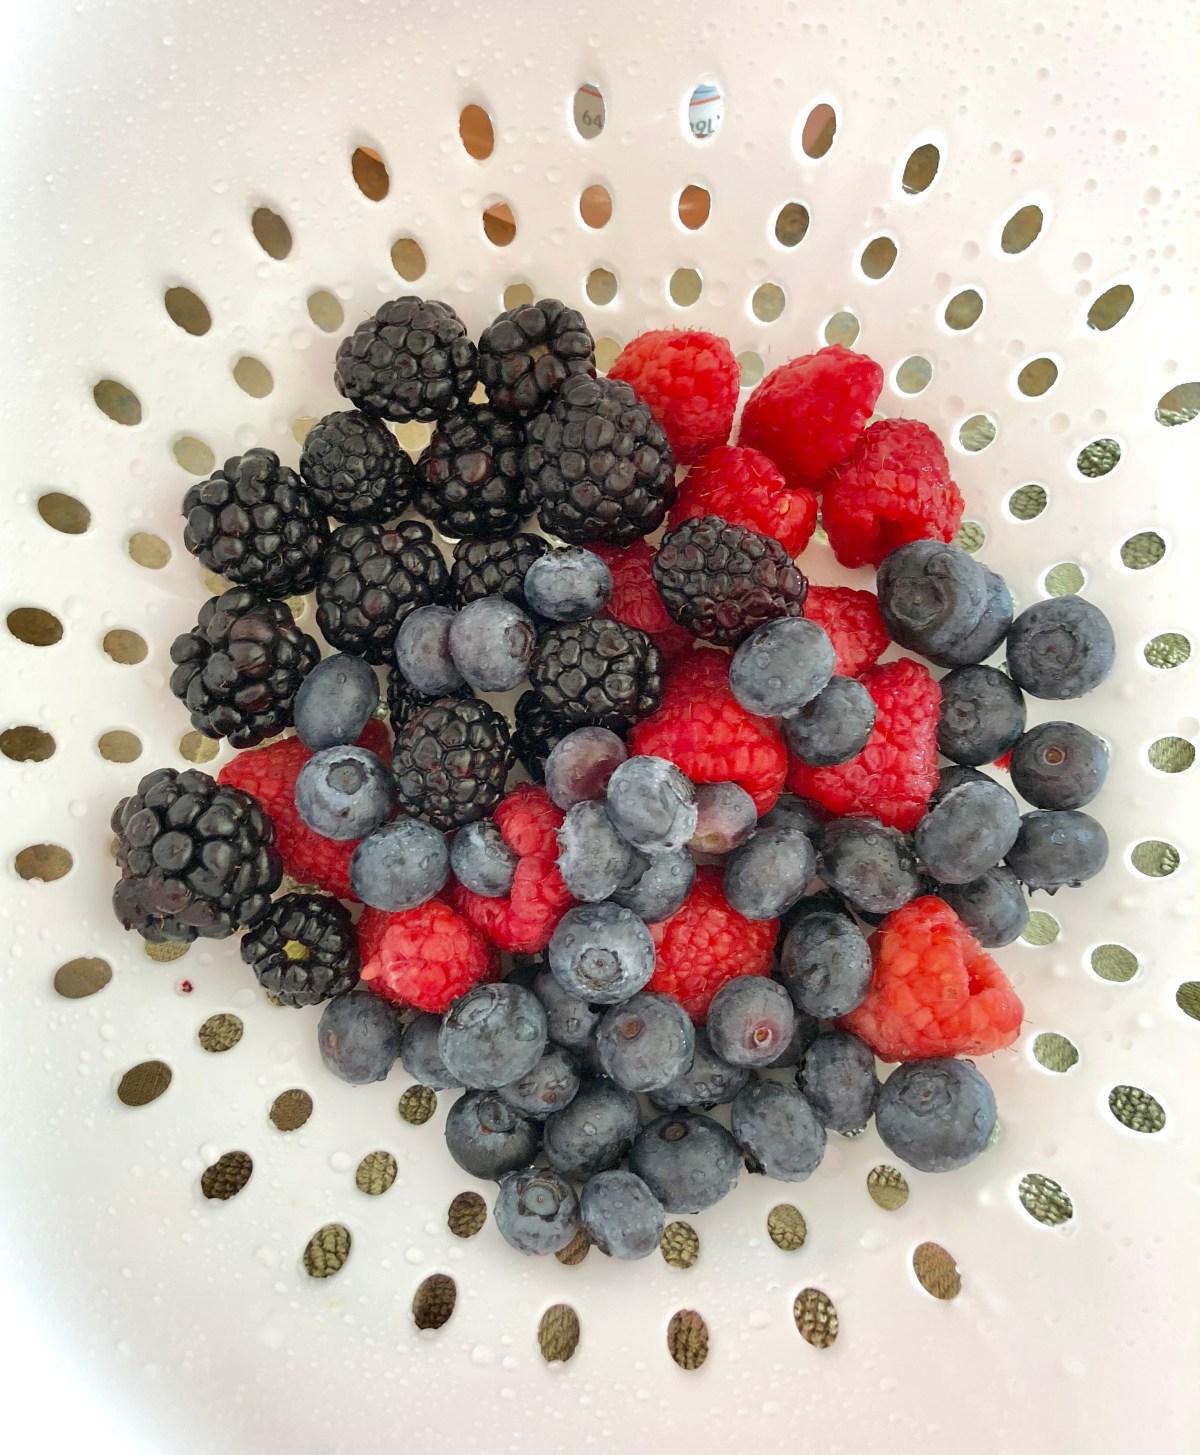 Summer Berry Sangria by Happylifeblogspot.com #sangria #mixedberrysangria #berrysangria #summercocktail #redwhiteandbluesangria